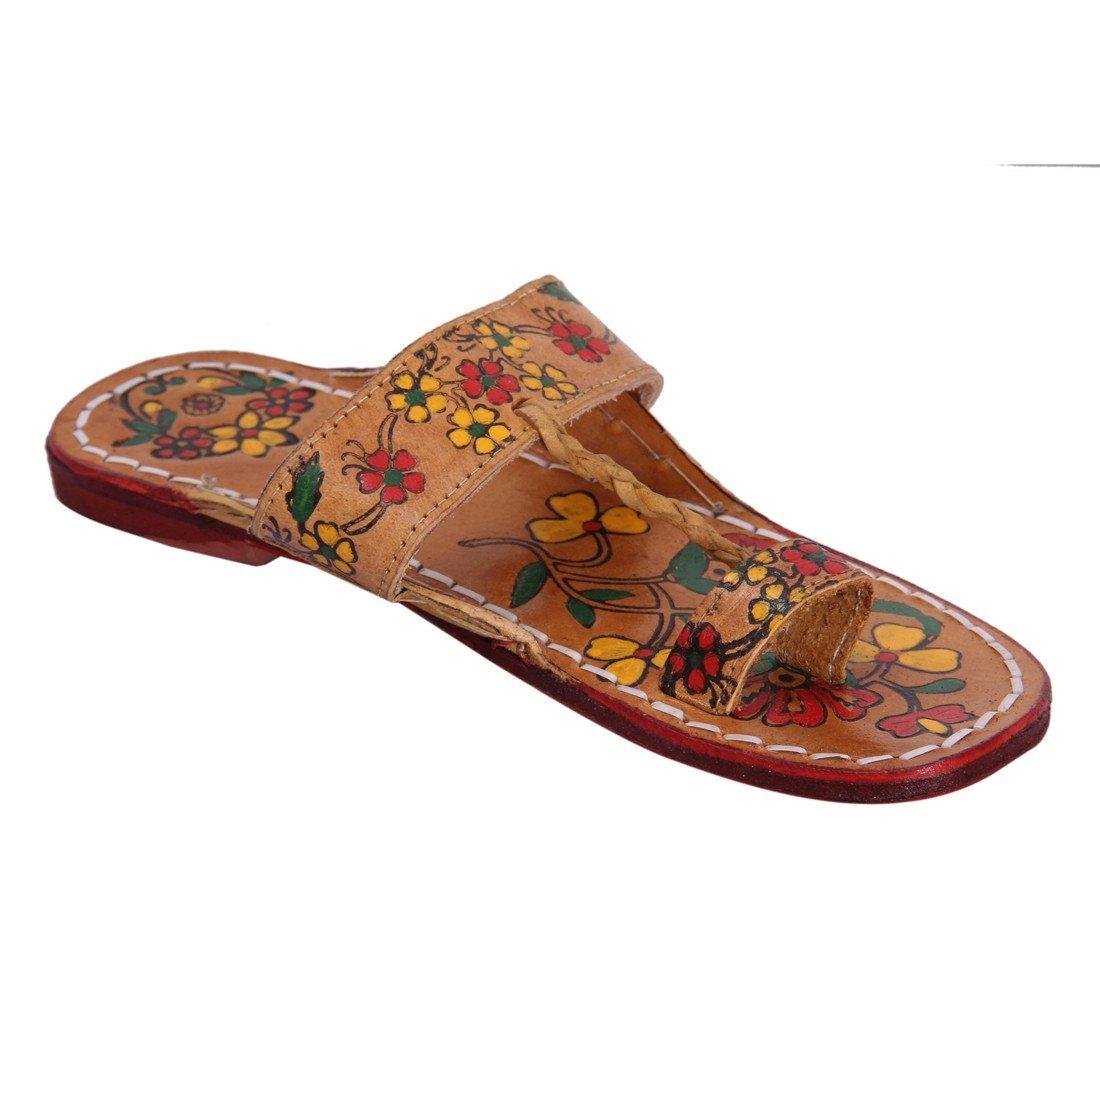 INDCROWN Hippie Indian Water Buffalo Jesus Sandle 100% Leather Kolhapuri Flat Flower Print Woman Sandle B07F776RN3 8 B(M) US|Yellow